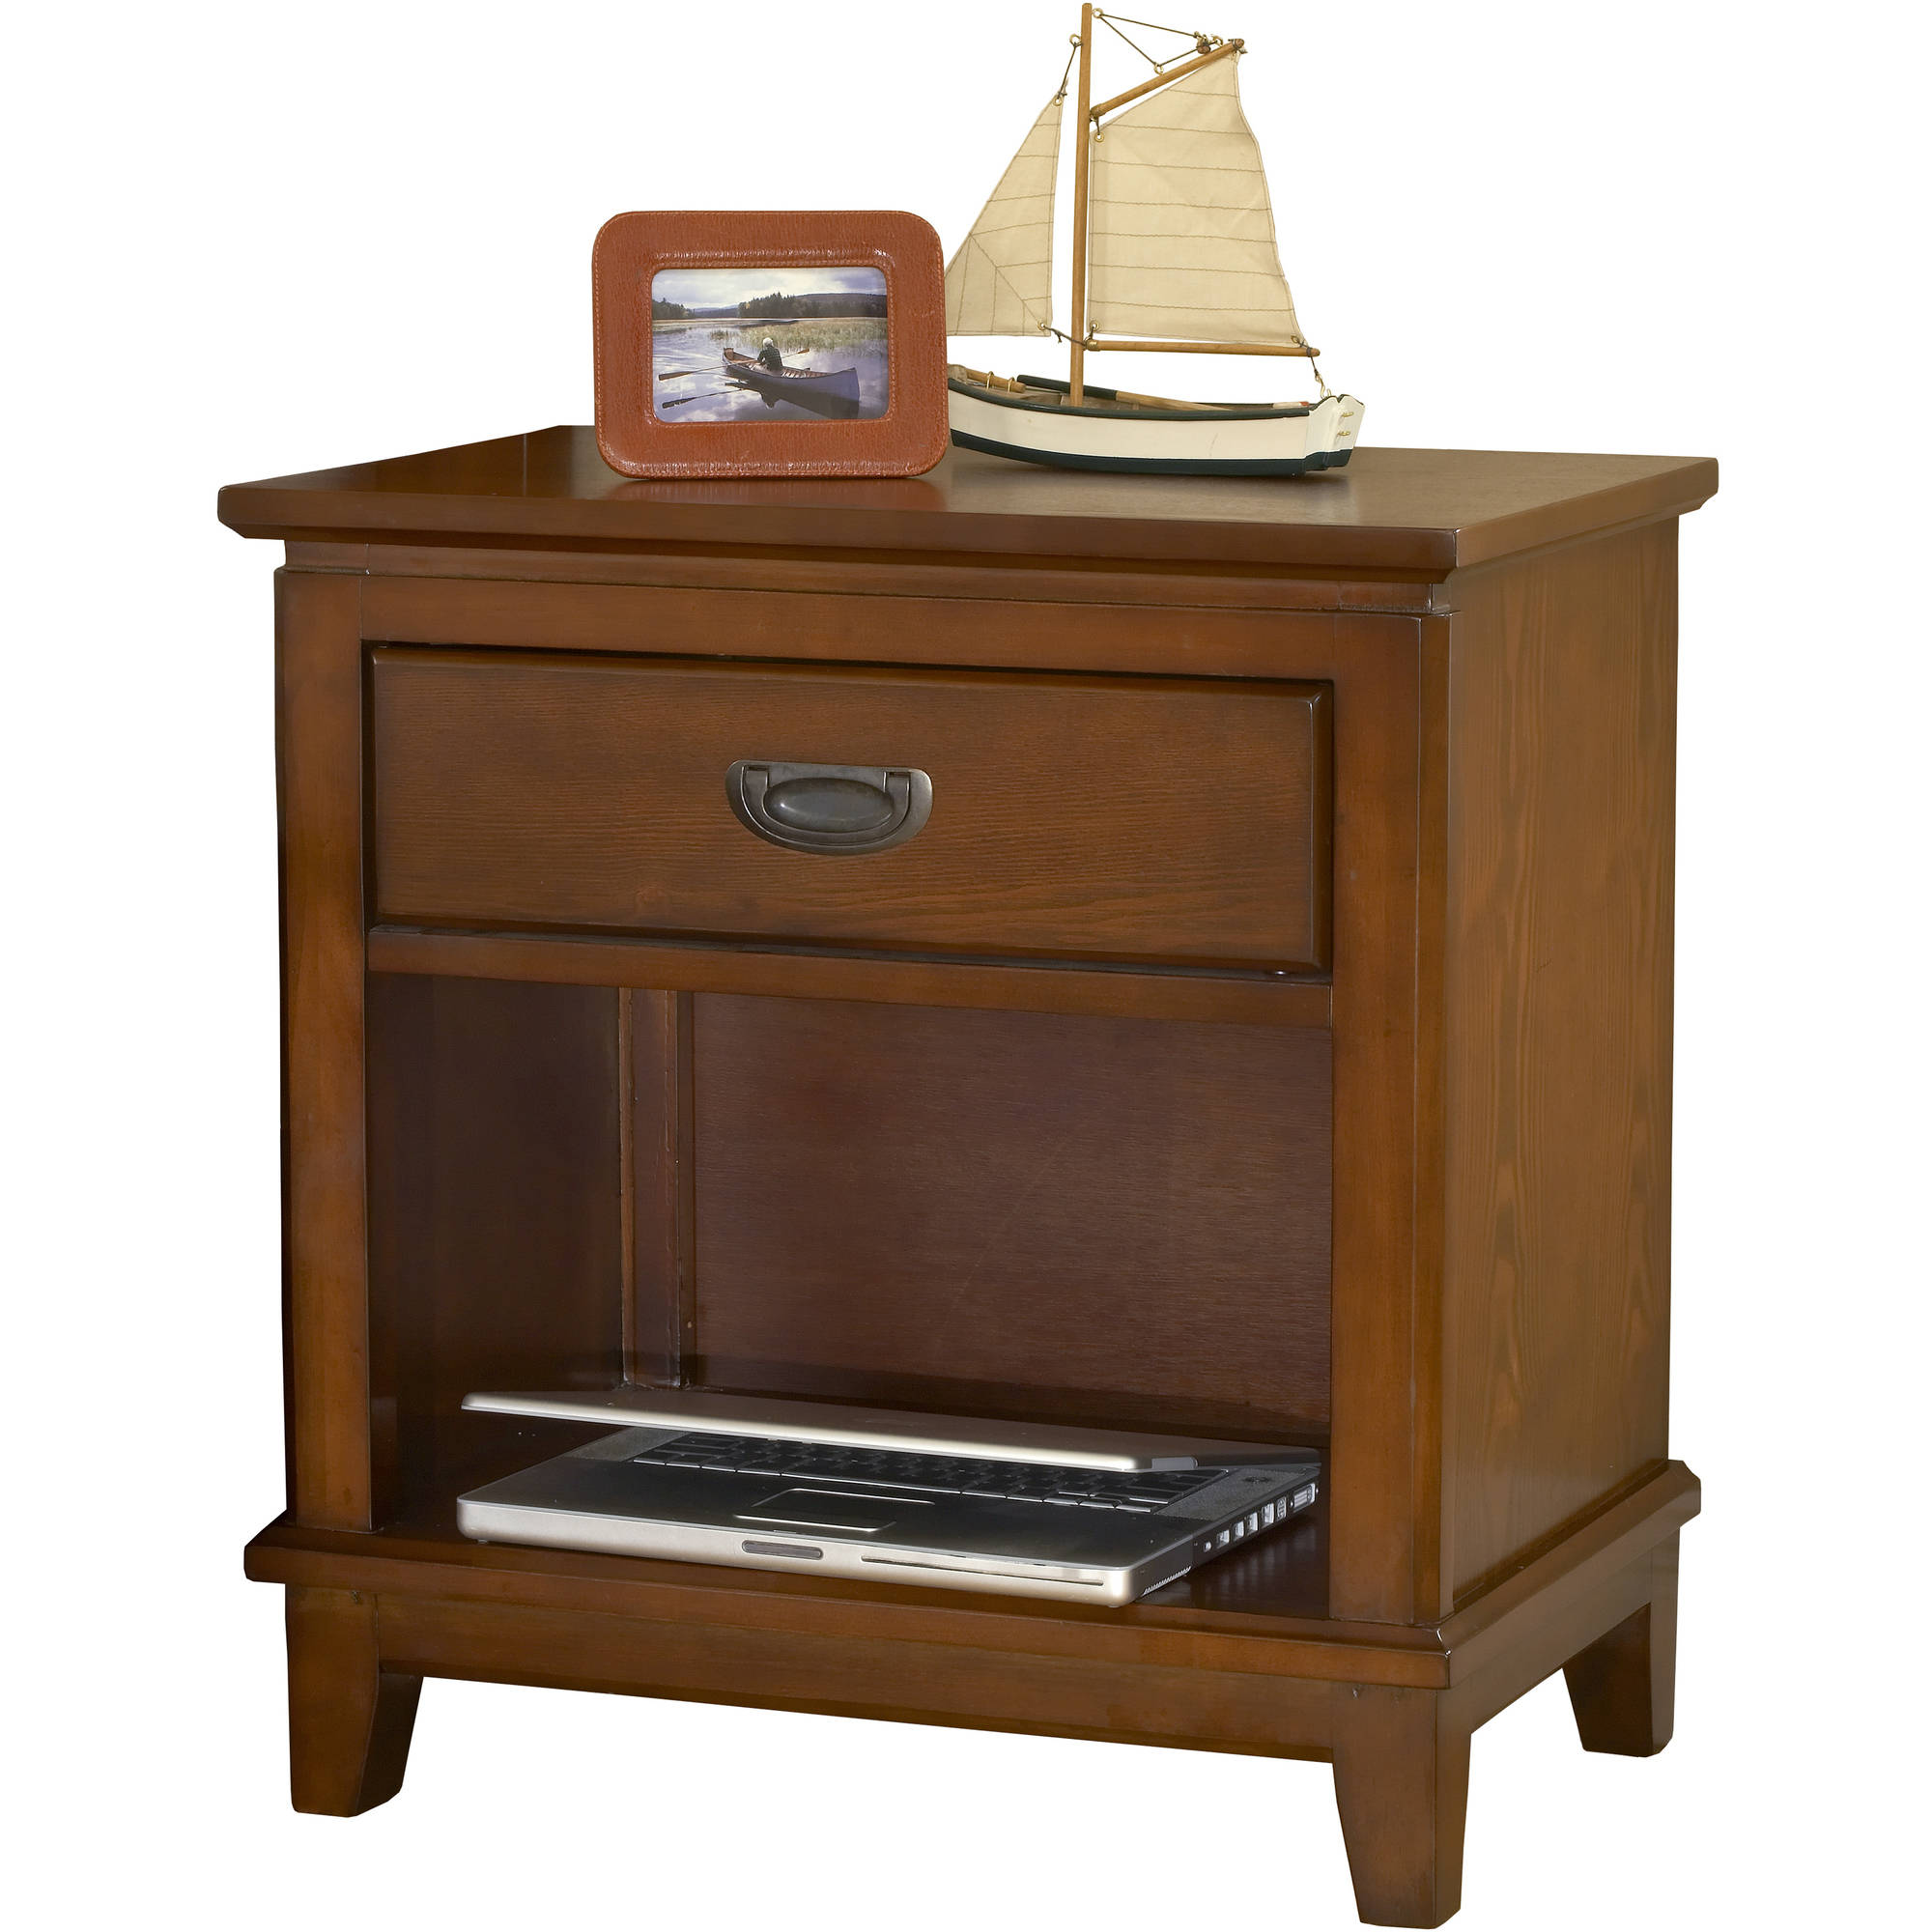 Cambridge 98900NS-HN 1-Drawer in Honey Oak Childrens Nightstands Furniture,